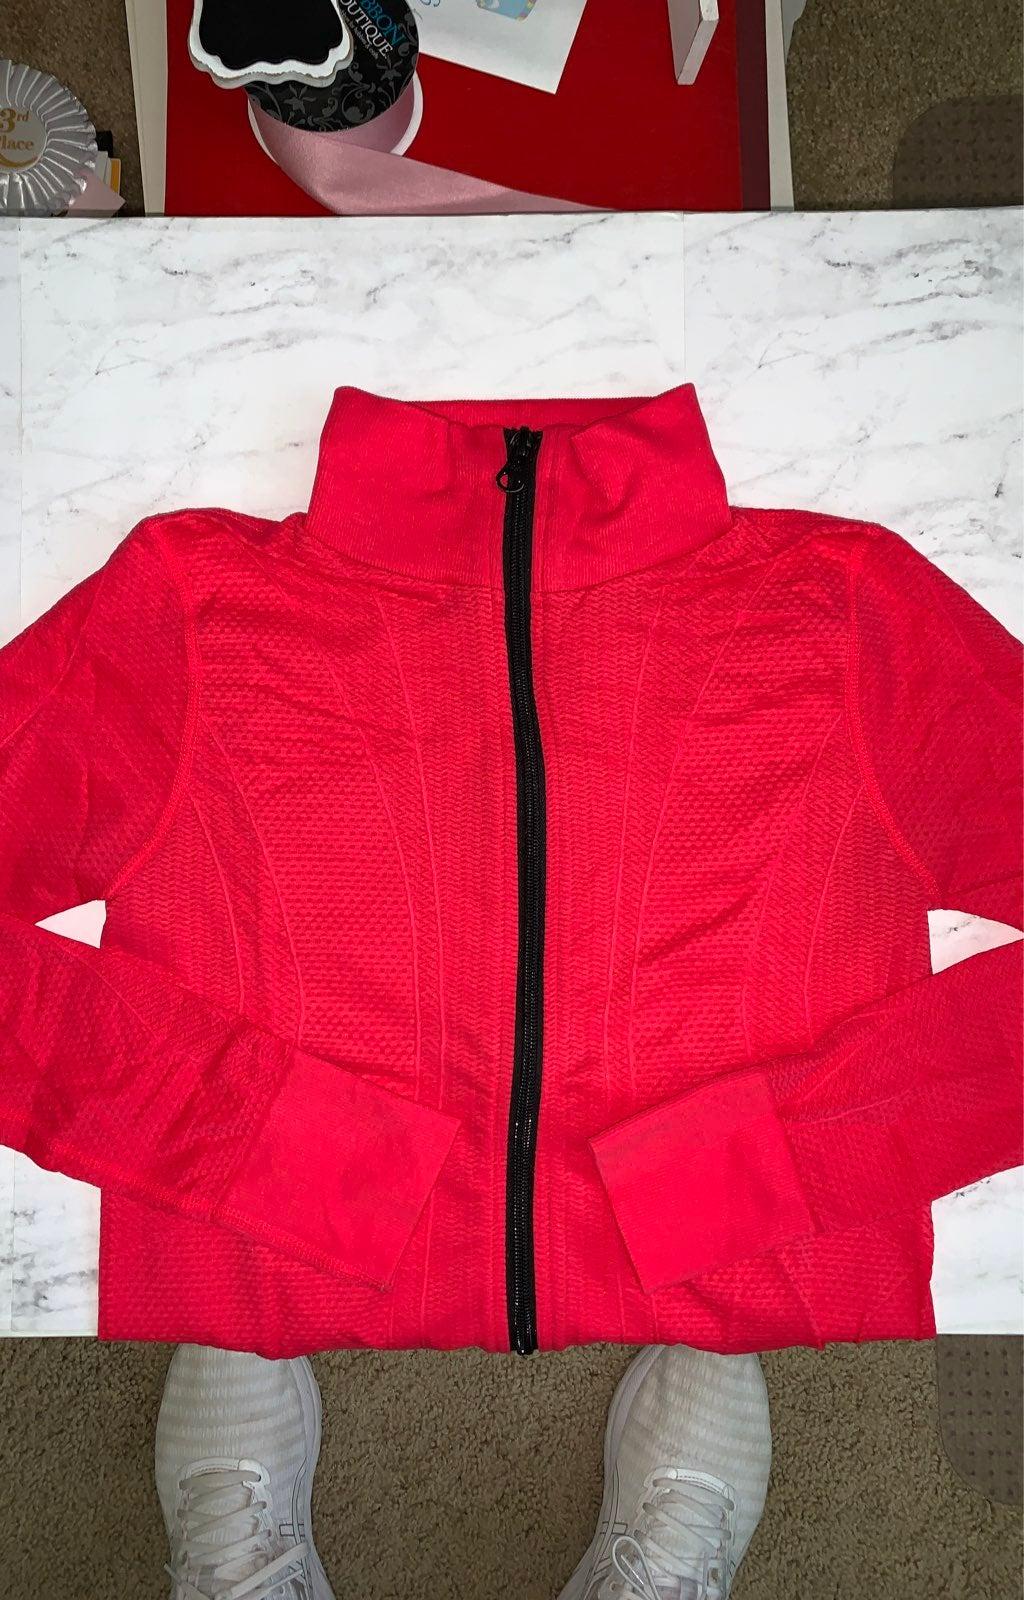 Lorna Jane Athletic Jacket